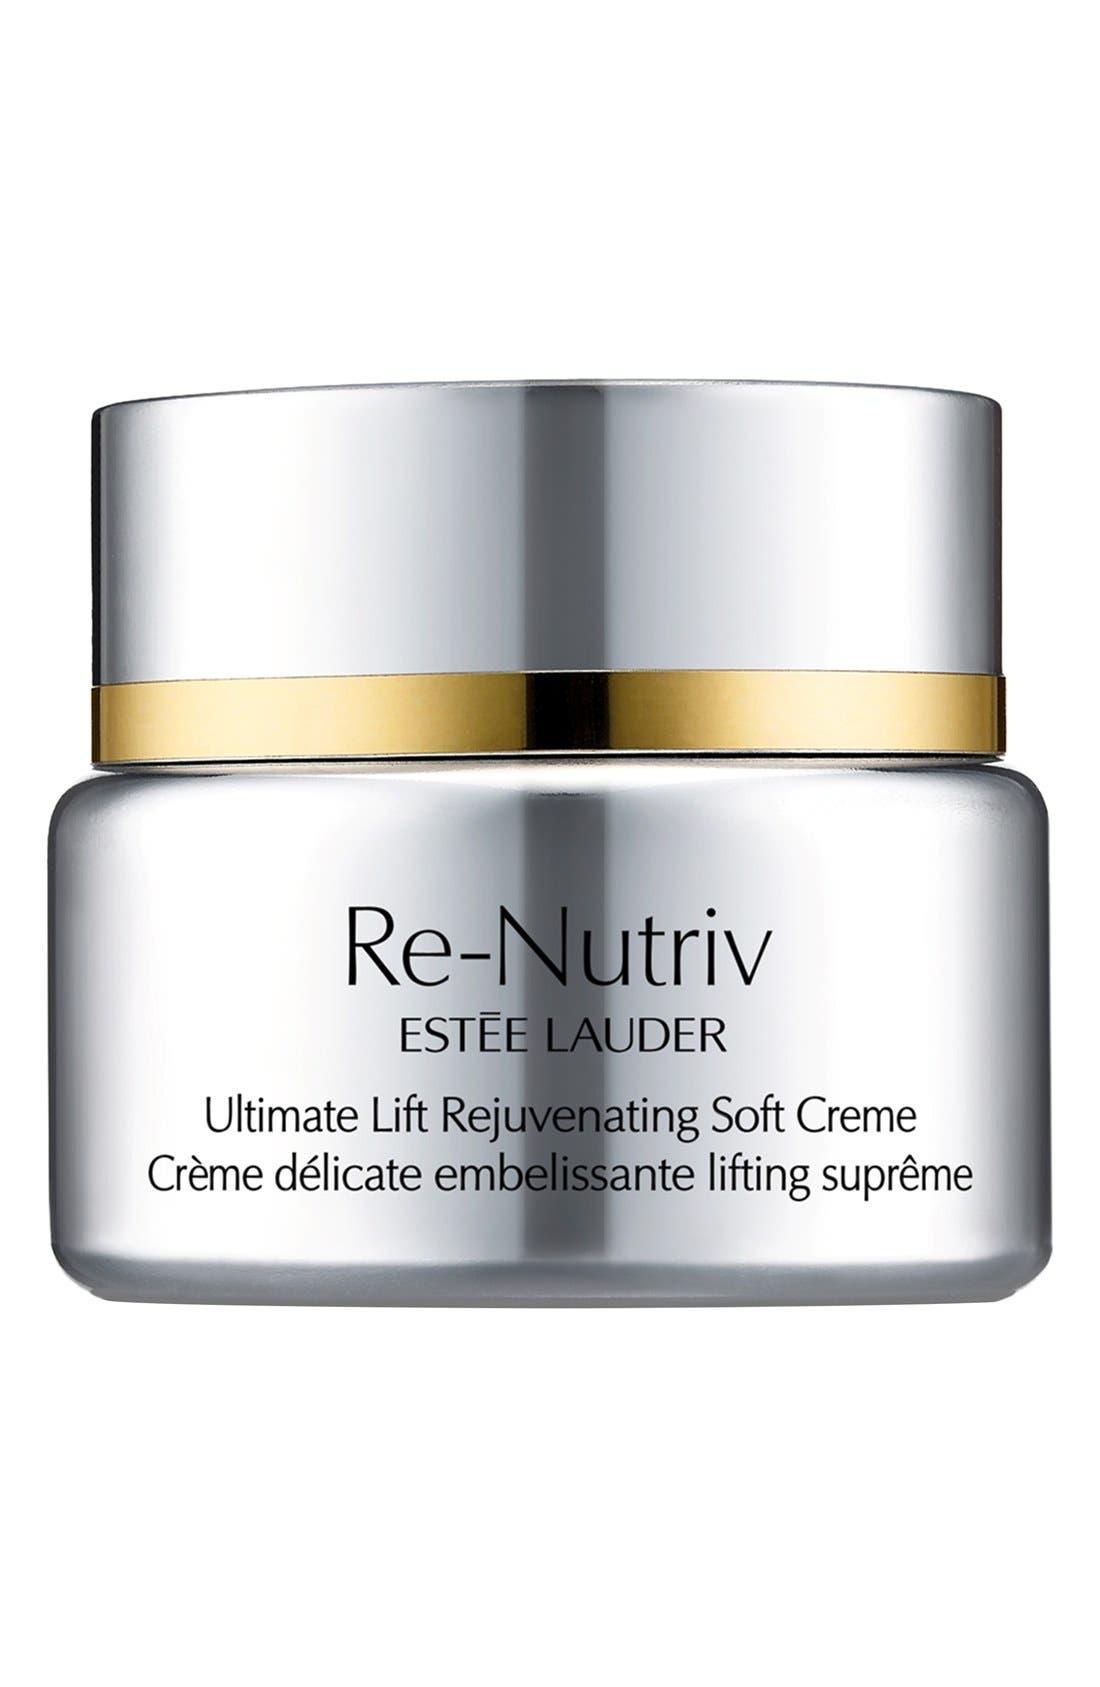 Re-Nutriv Ultimate Lift Rejuvenating Soft Crème,                         Main,                         color, 000